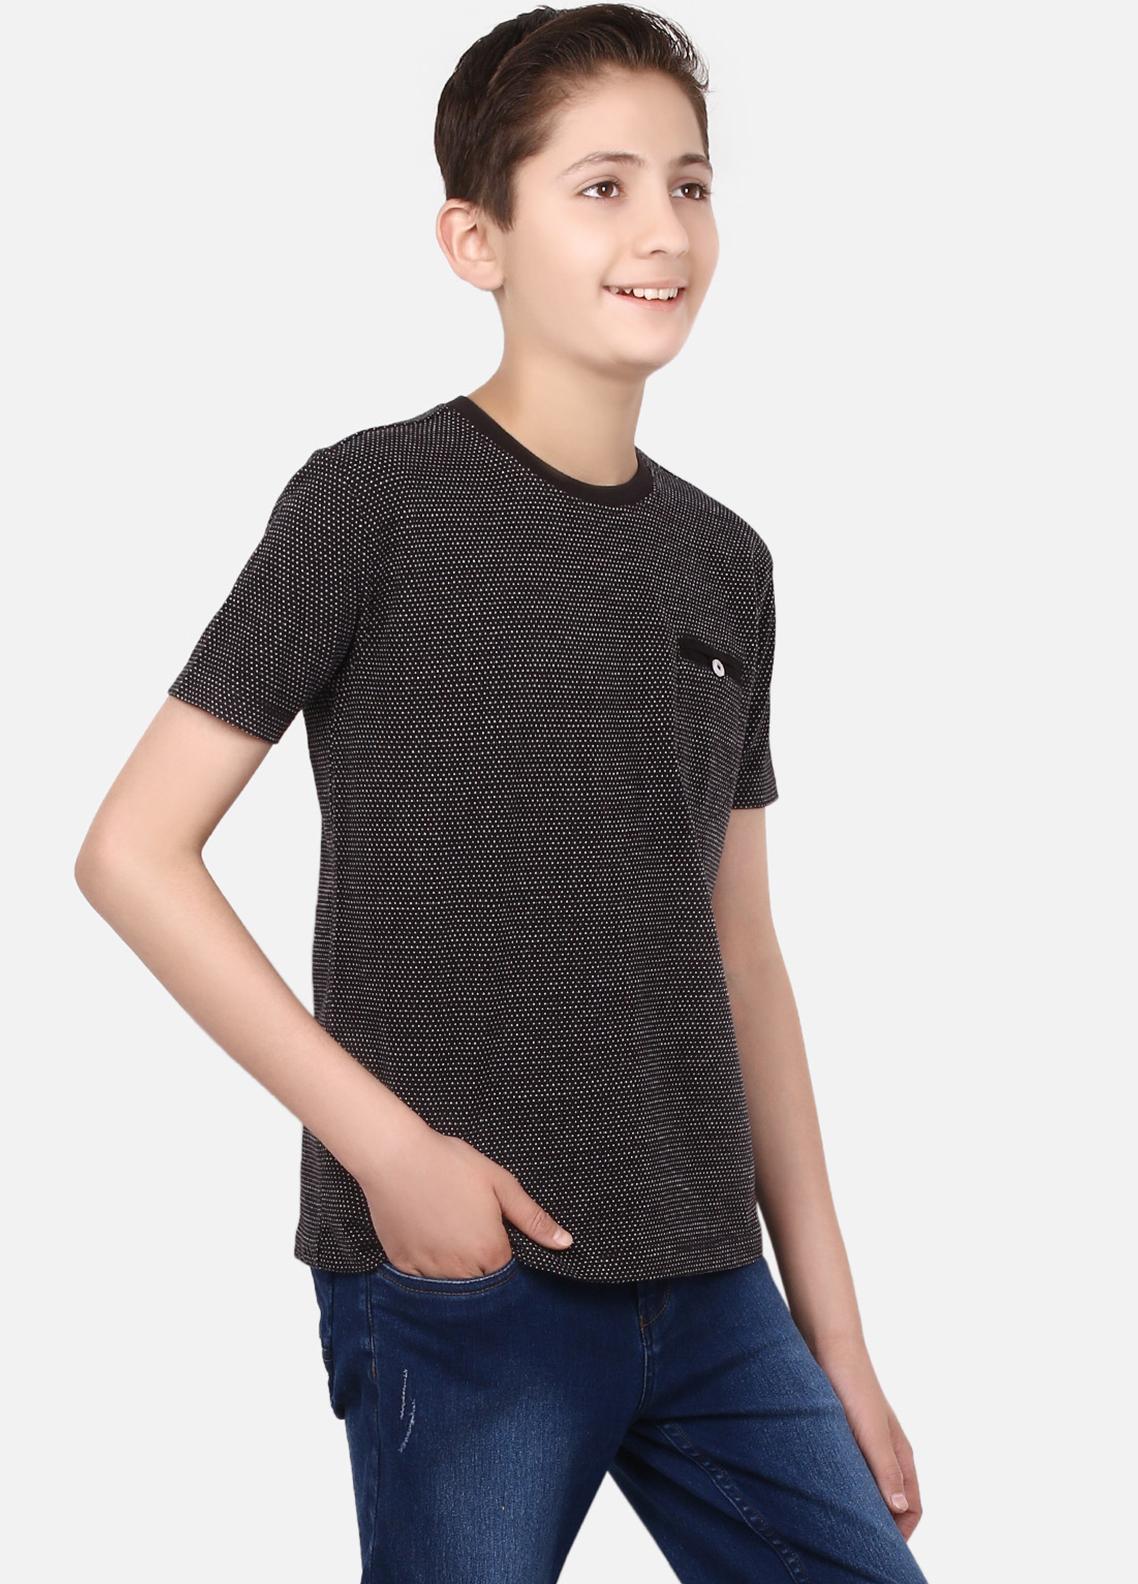 60caa85c6 Buy Edenrobe Cotton Half Sleeves Tees for Boys - Black EBTTS19-020 - Online  in Pakistan